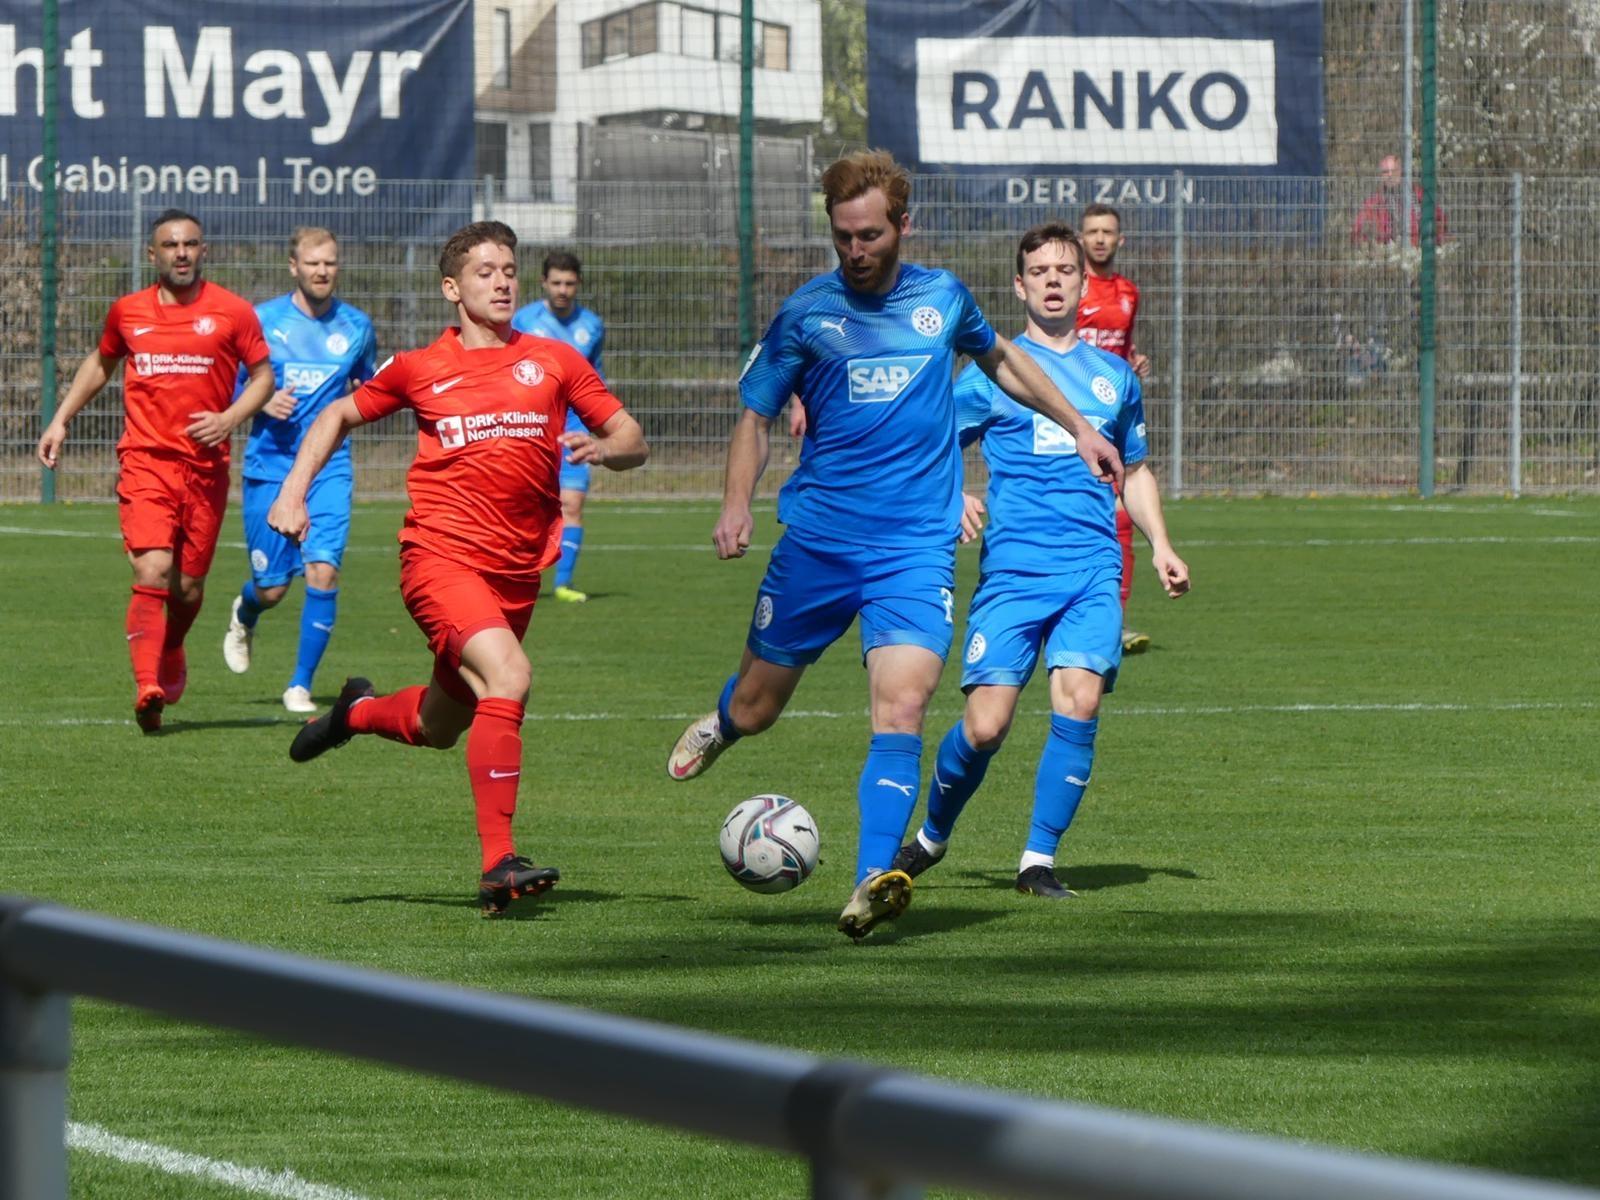 FC Astoria Walldorf - KSV Hessen Kassel: Serkan Durna